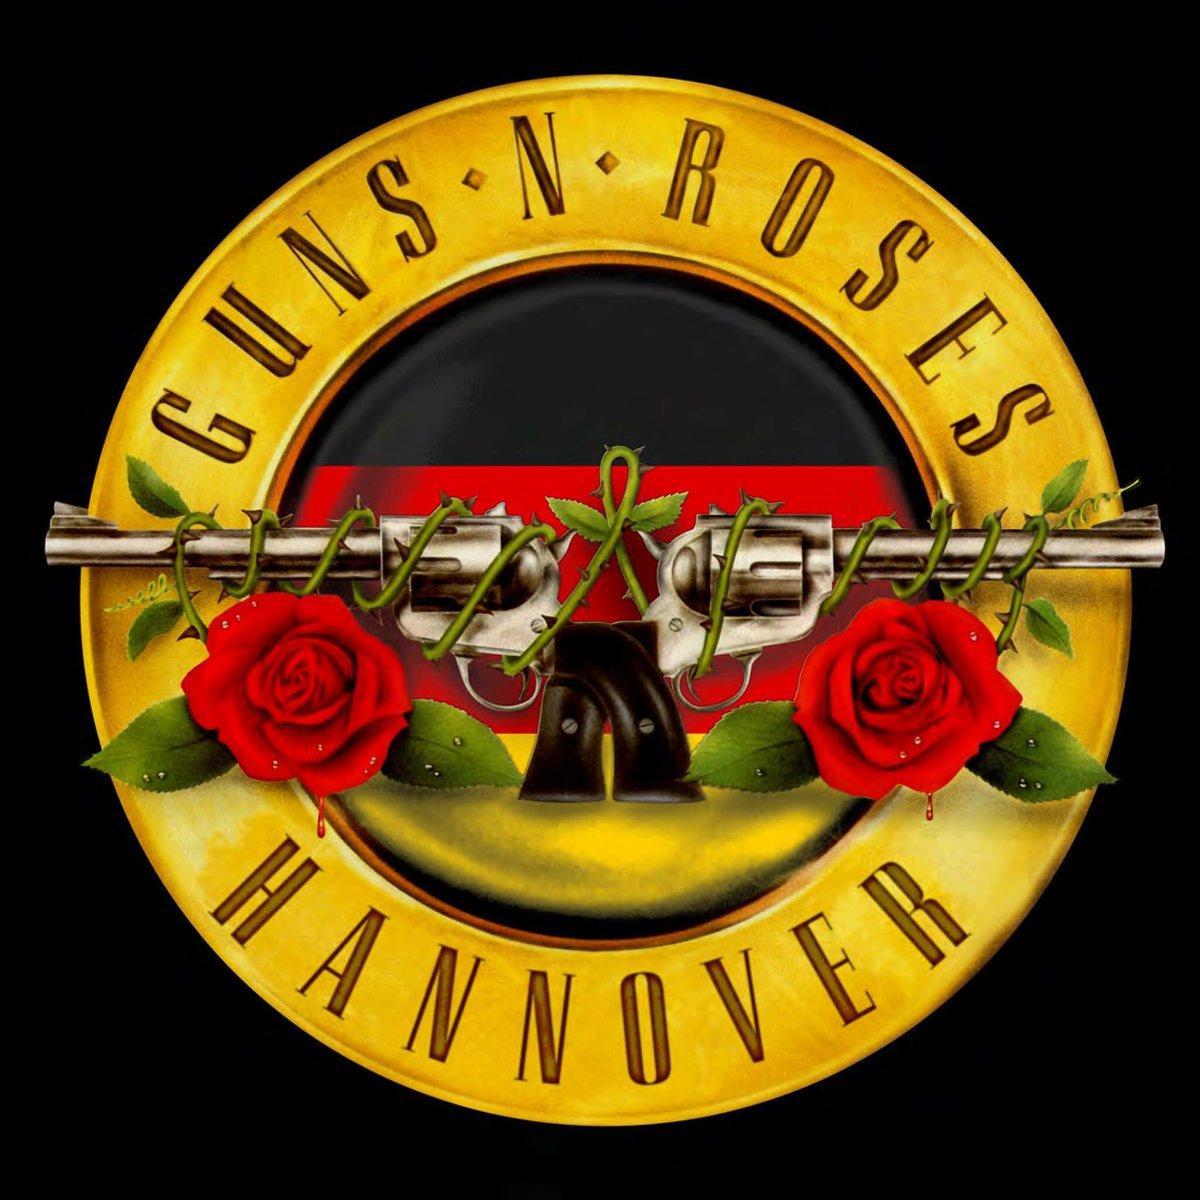 Guns N Roses On Twitter Back In Deutschland Hannover Up Next